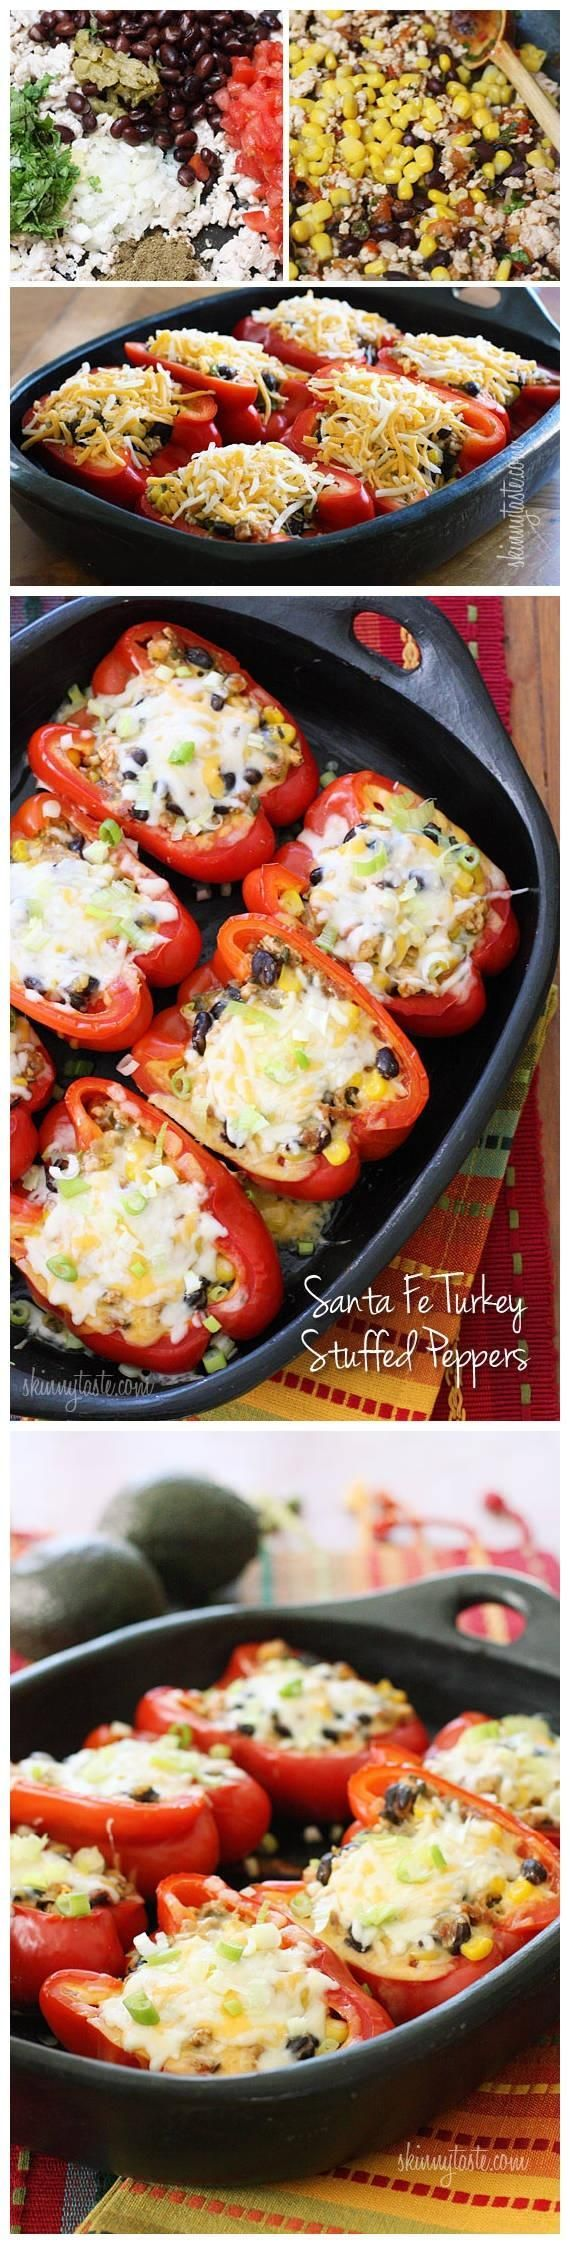 Santa Fe Turkey Stuffed Peppers | Recipes to try | Pinterest